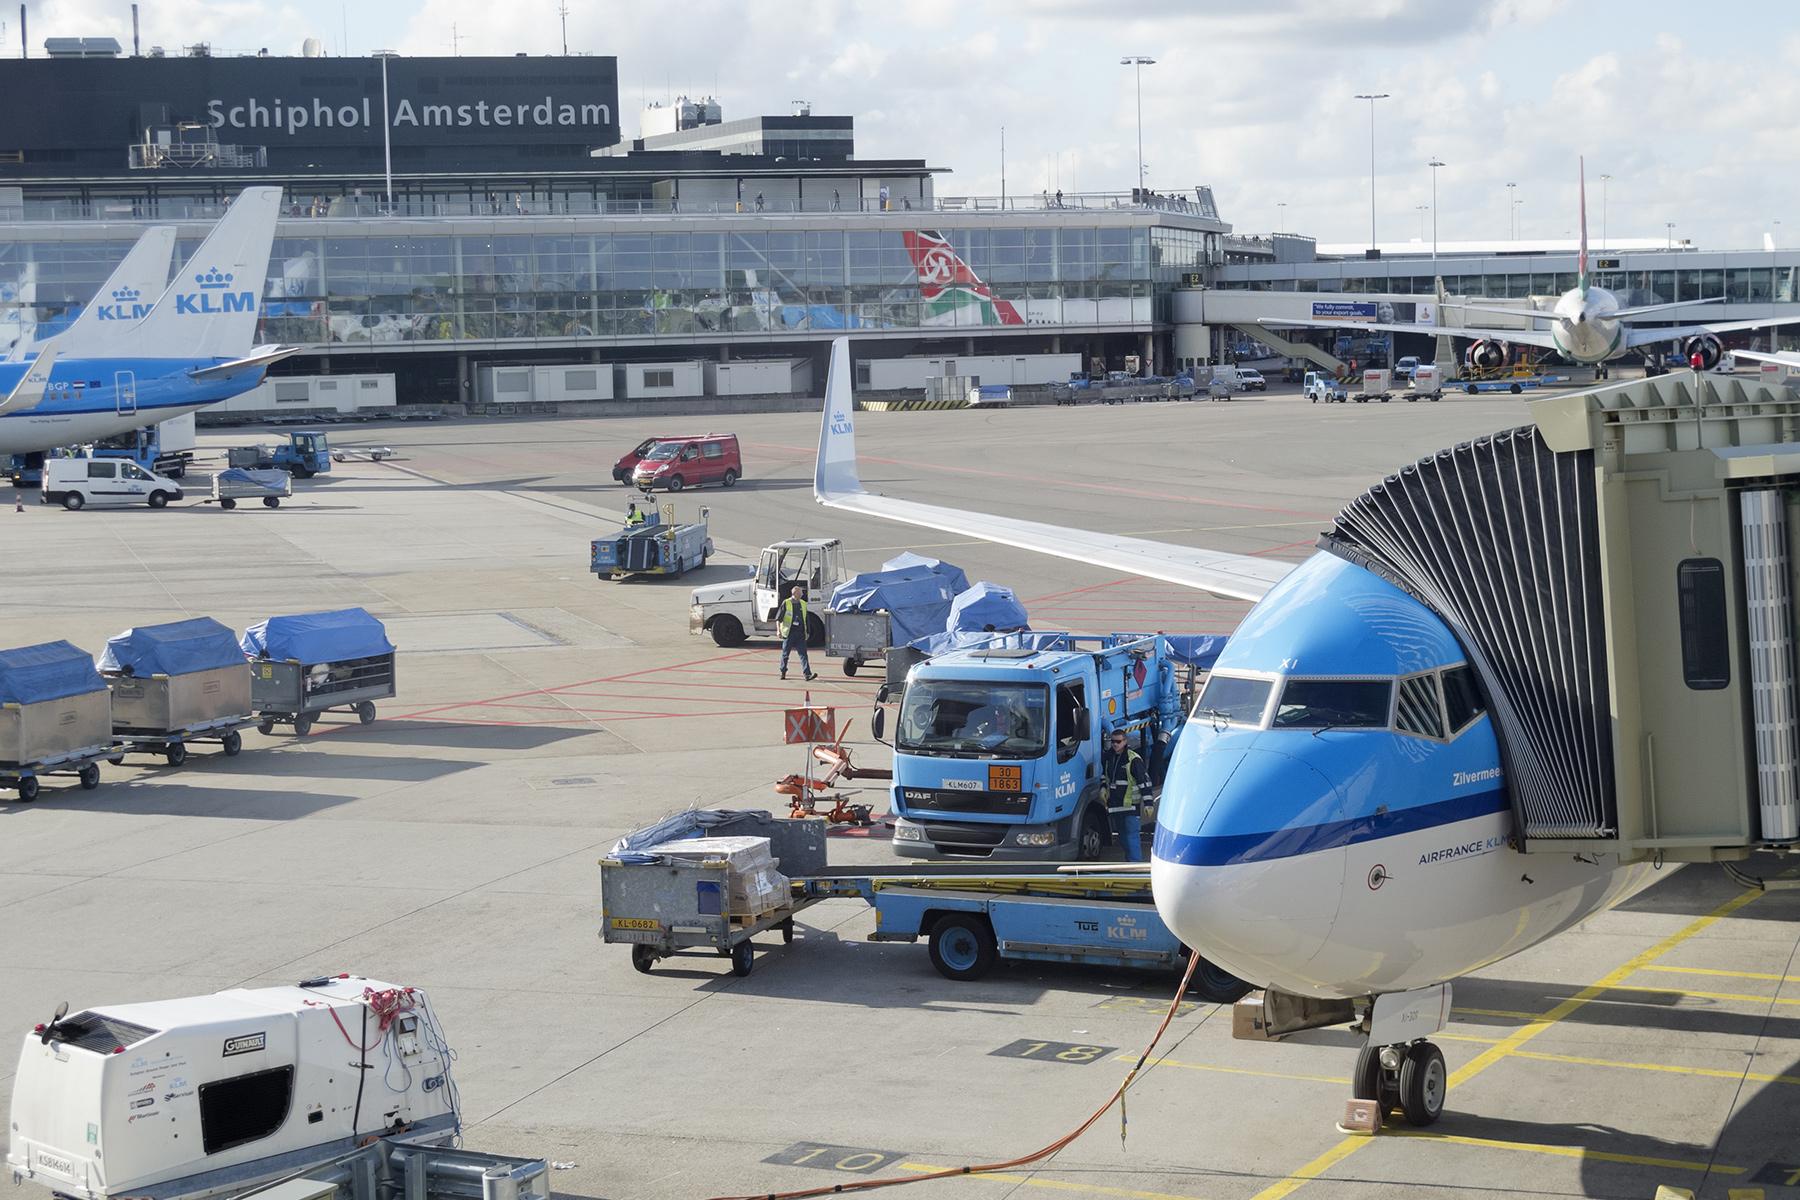 Planes at Schiphol